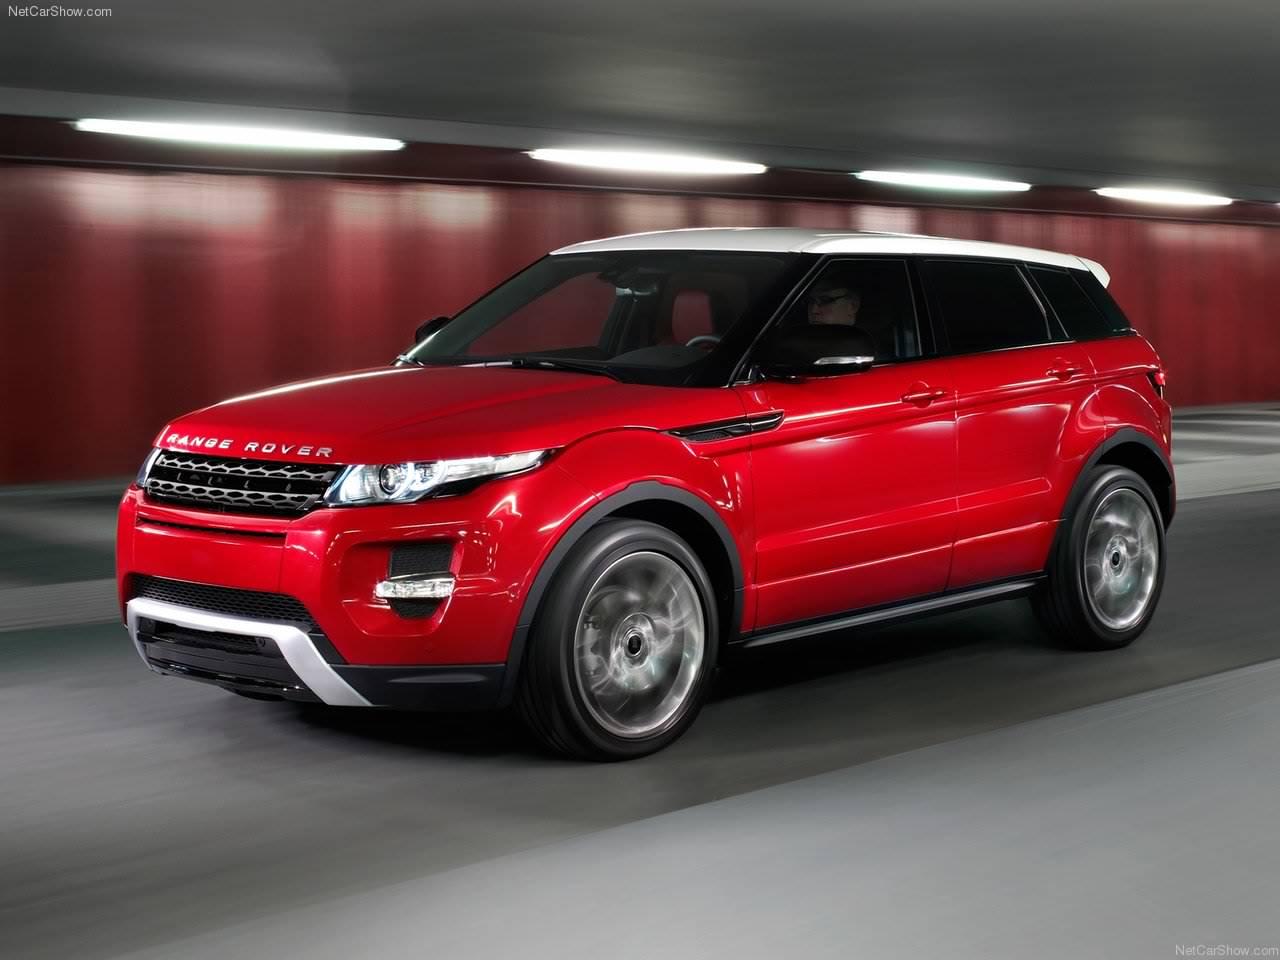 http://1.bp.blogspot.com/_lsyt_wQ2awY/TNo_7ZyveII/AAAAAAACHBs/ixwmXqUuVC8/s1600/Land_Rover-Range_Rover_Evoque_5-door_2012_1280x960_wallpaper_01.jpg